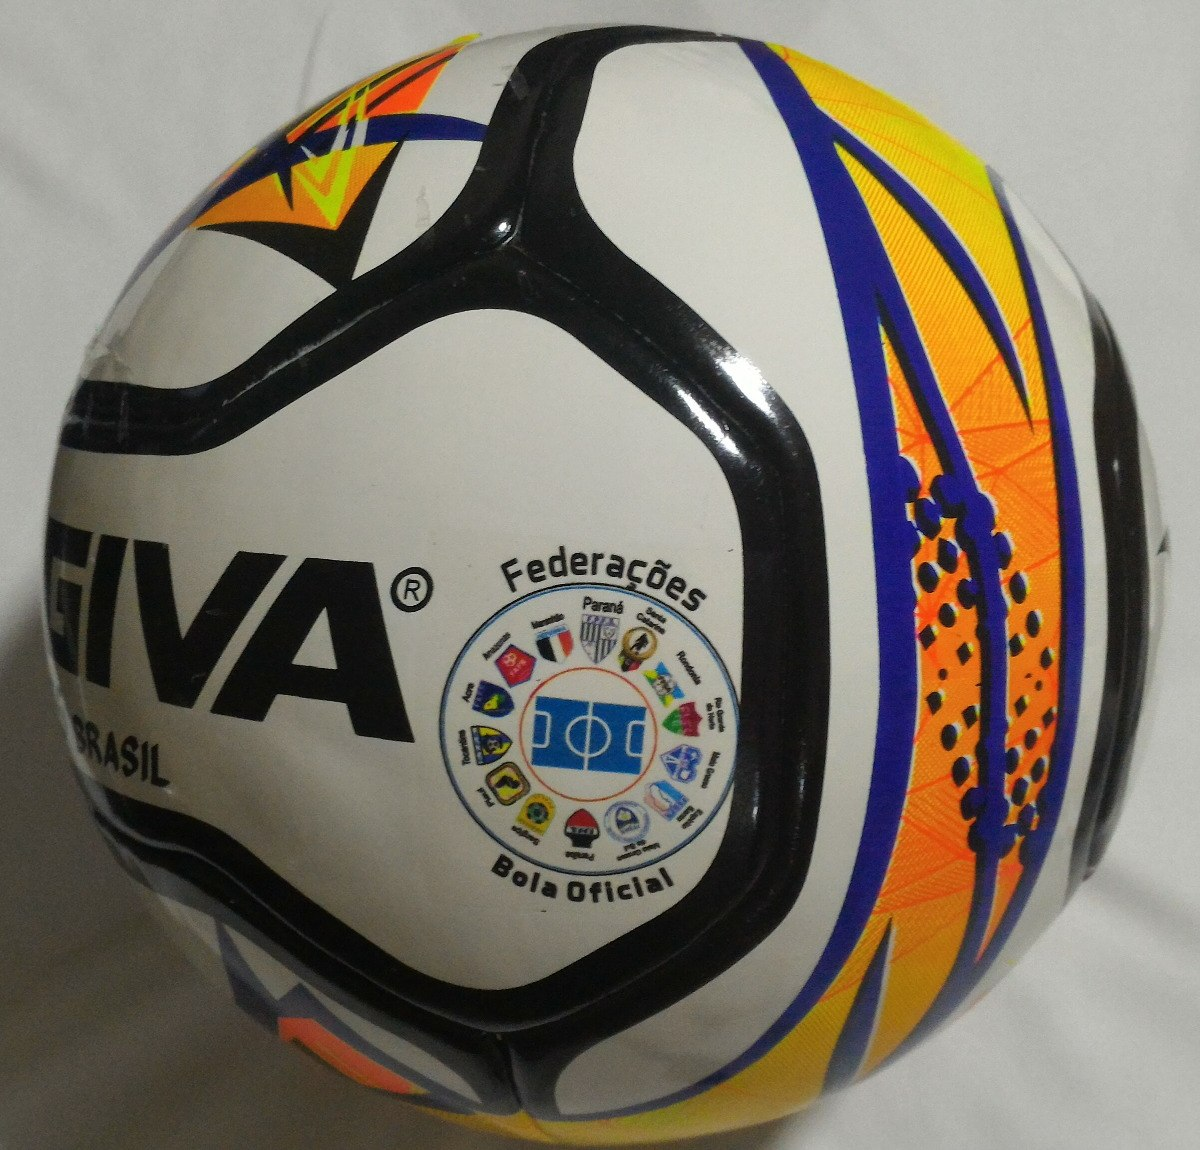 a164eb70b0aca bola futsal kagiva f5 pro brasil - federações 2018. Carregando zoom.